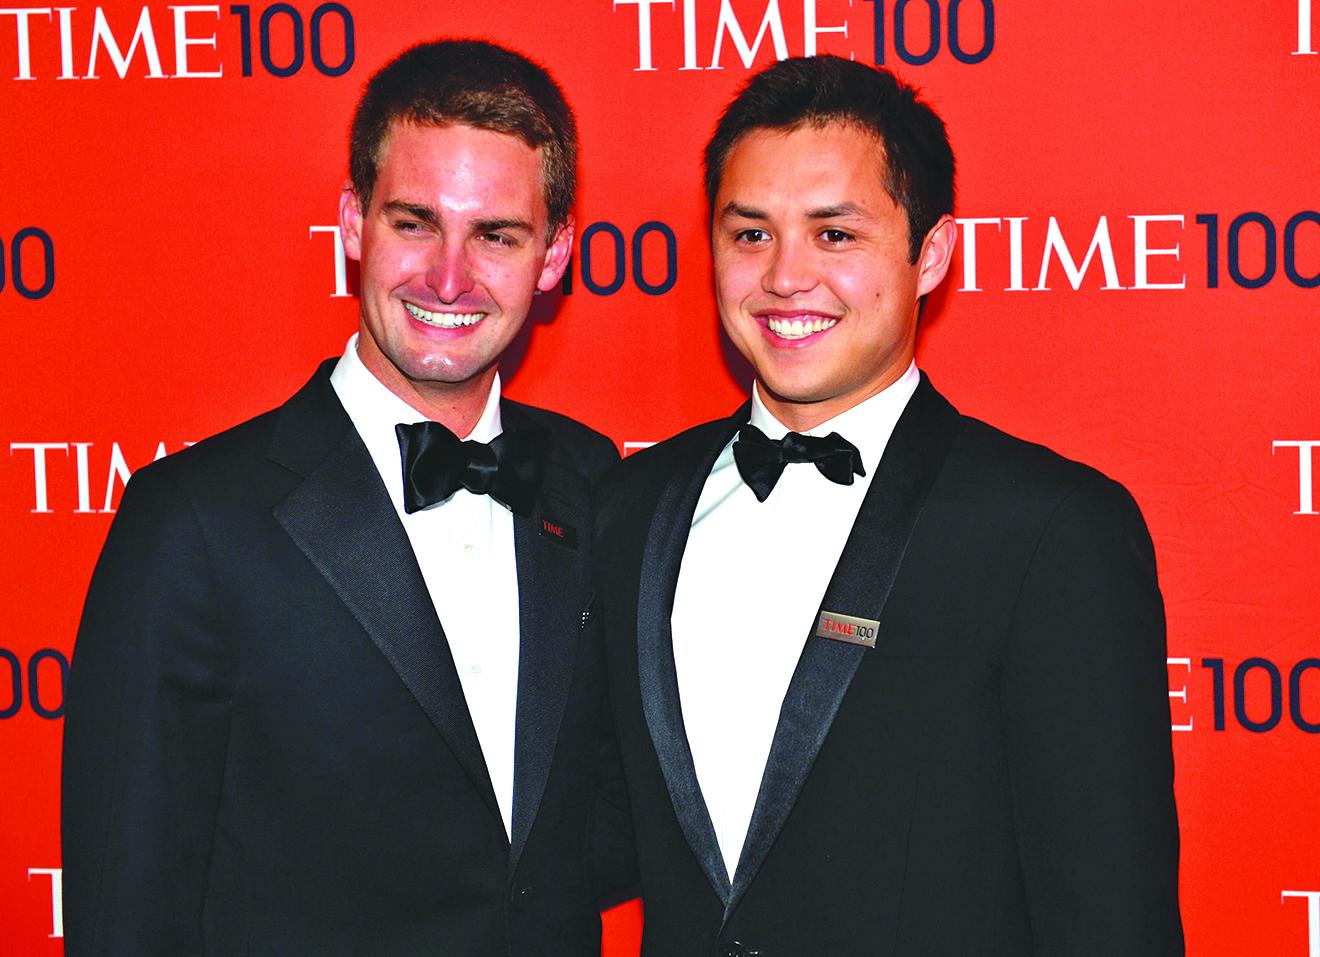 Snapchat的聯合創辦人埃文斯皮格爾(Evan Spiegel)(左)與31歲的鮑比墨菲(Bobby Murphy)(右)。